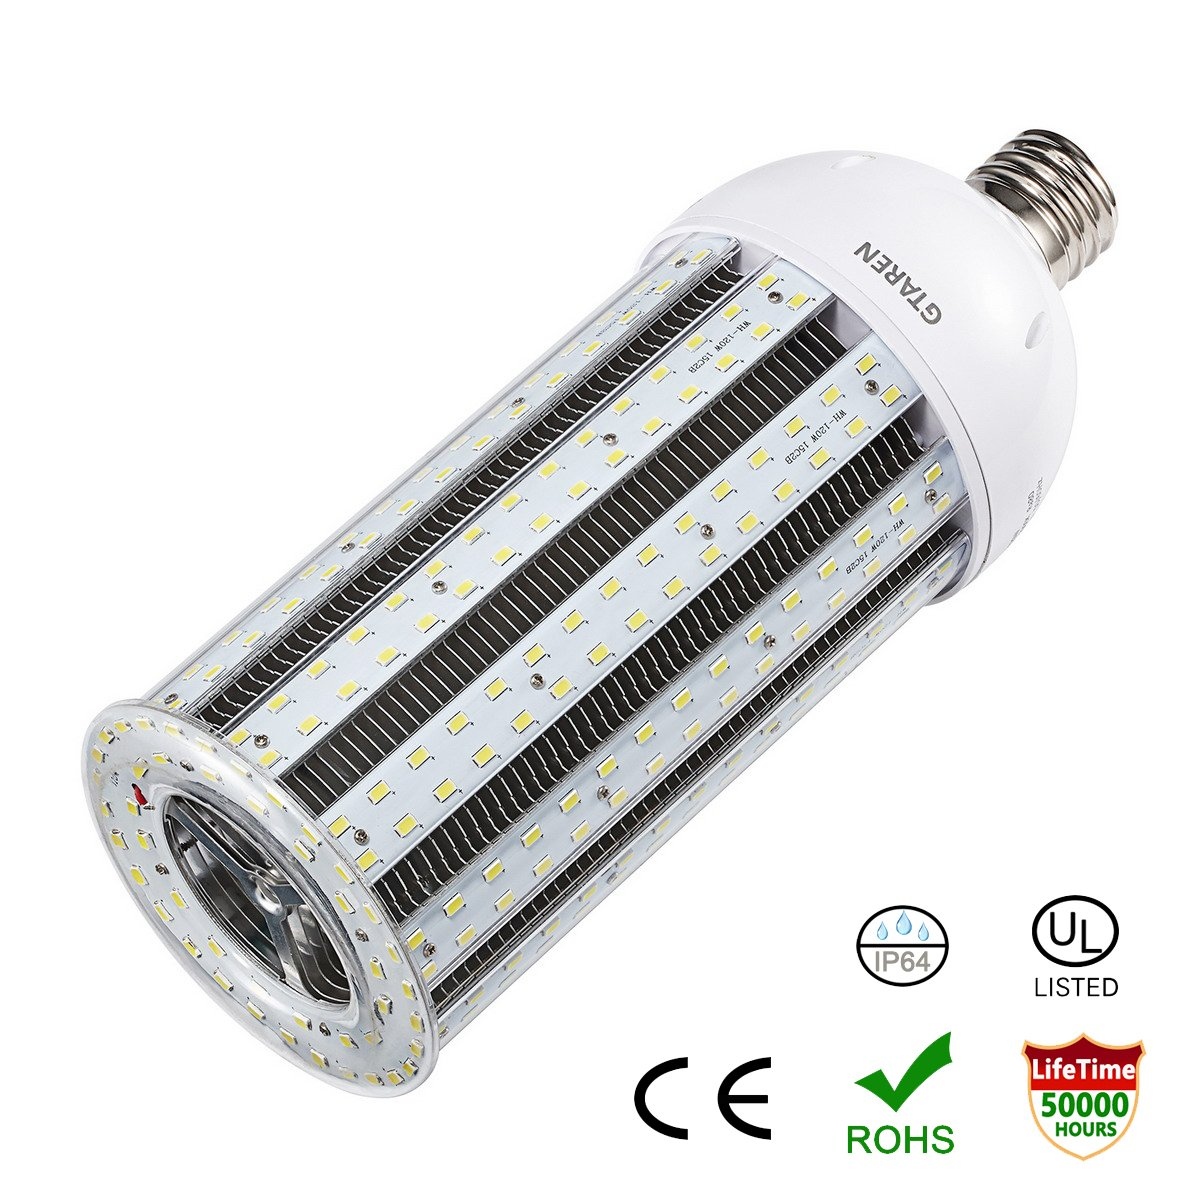 LED Corn Light Bulb 120W E39 Large Mogul Screw Base UL listed 15000Lm 5000K Daylight for Metal Halide HID CFL HPS,Replacement Garage Parking Lot High Bay Warehouse Street Lamp Lighting.